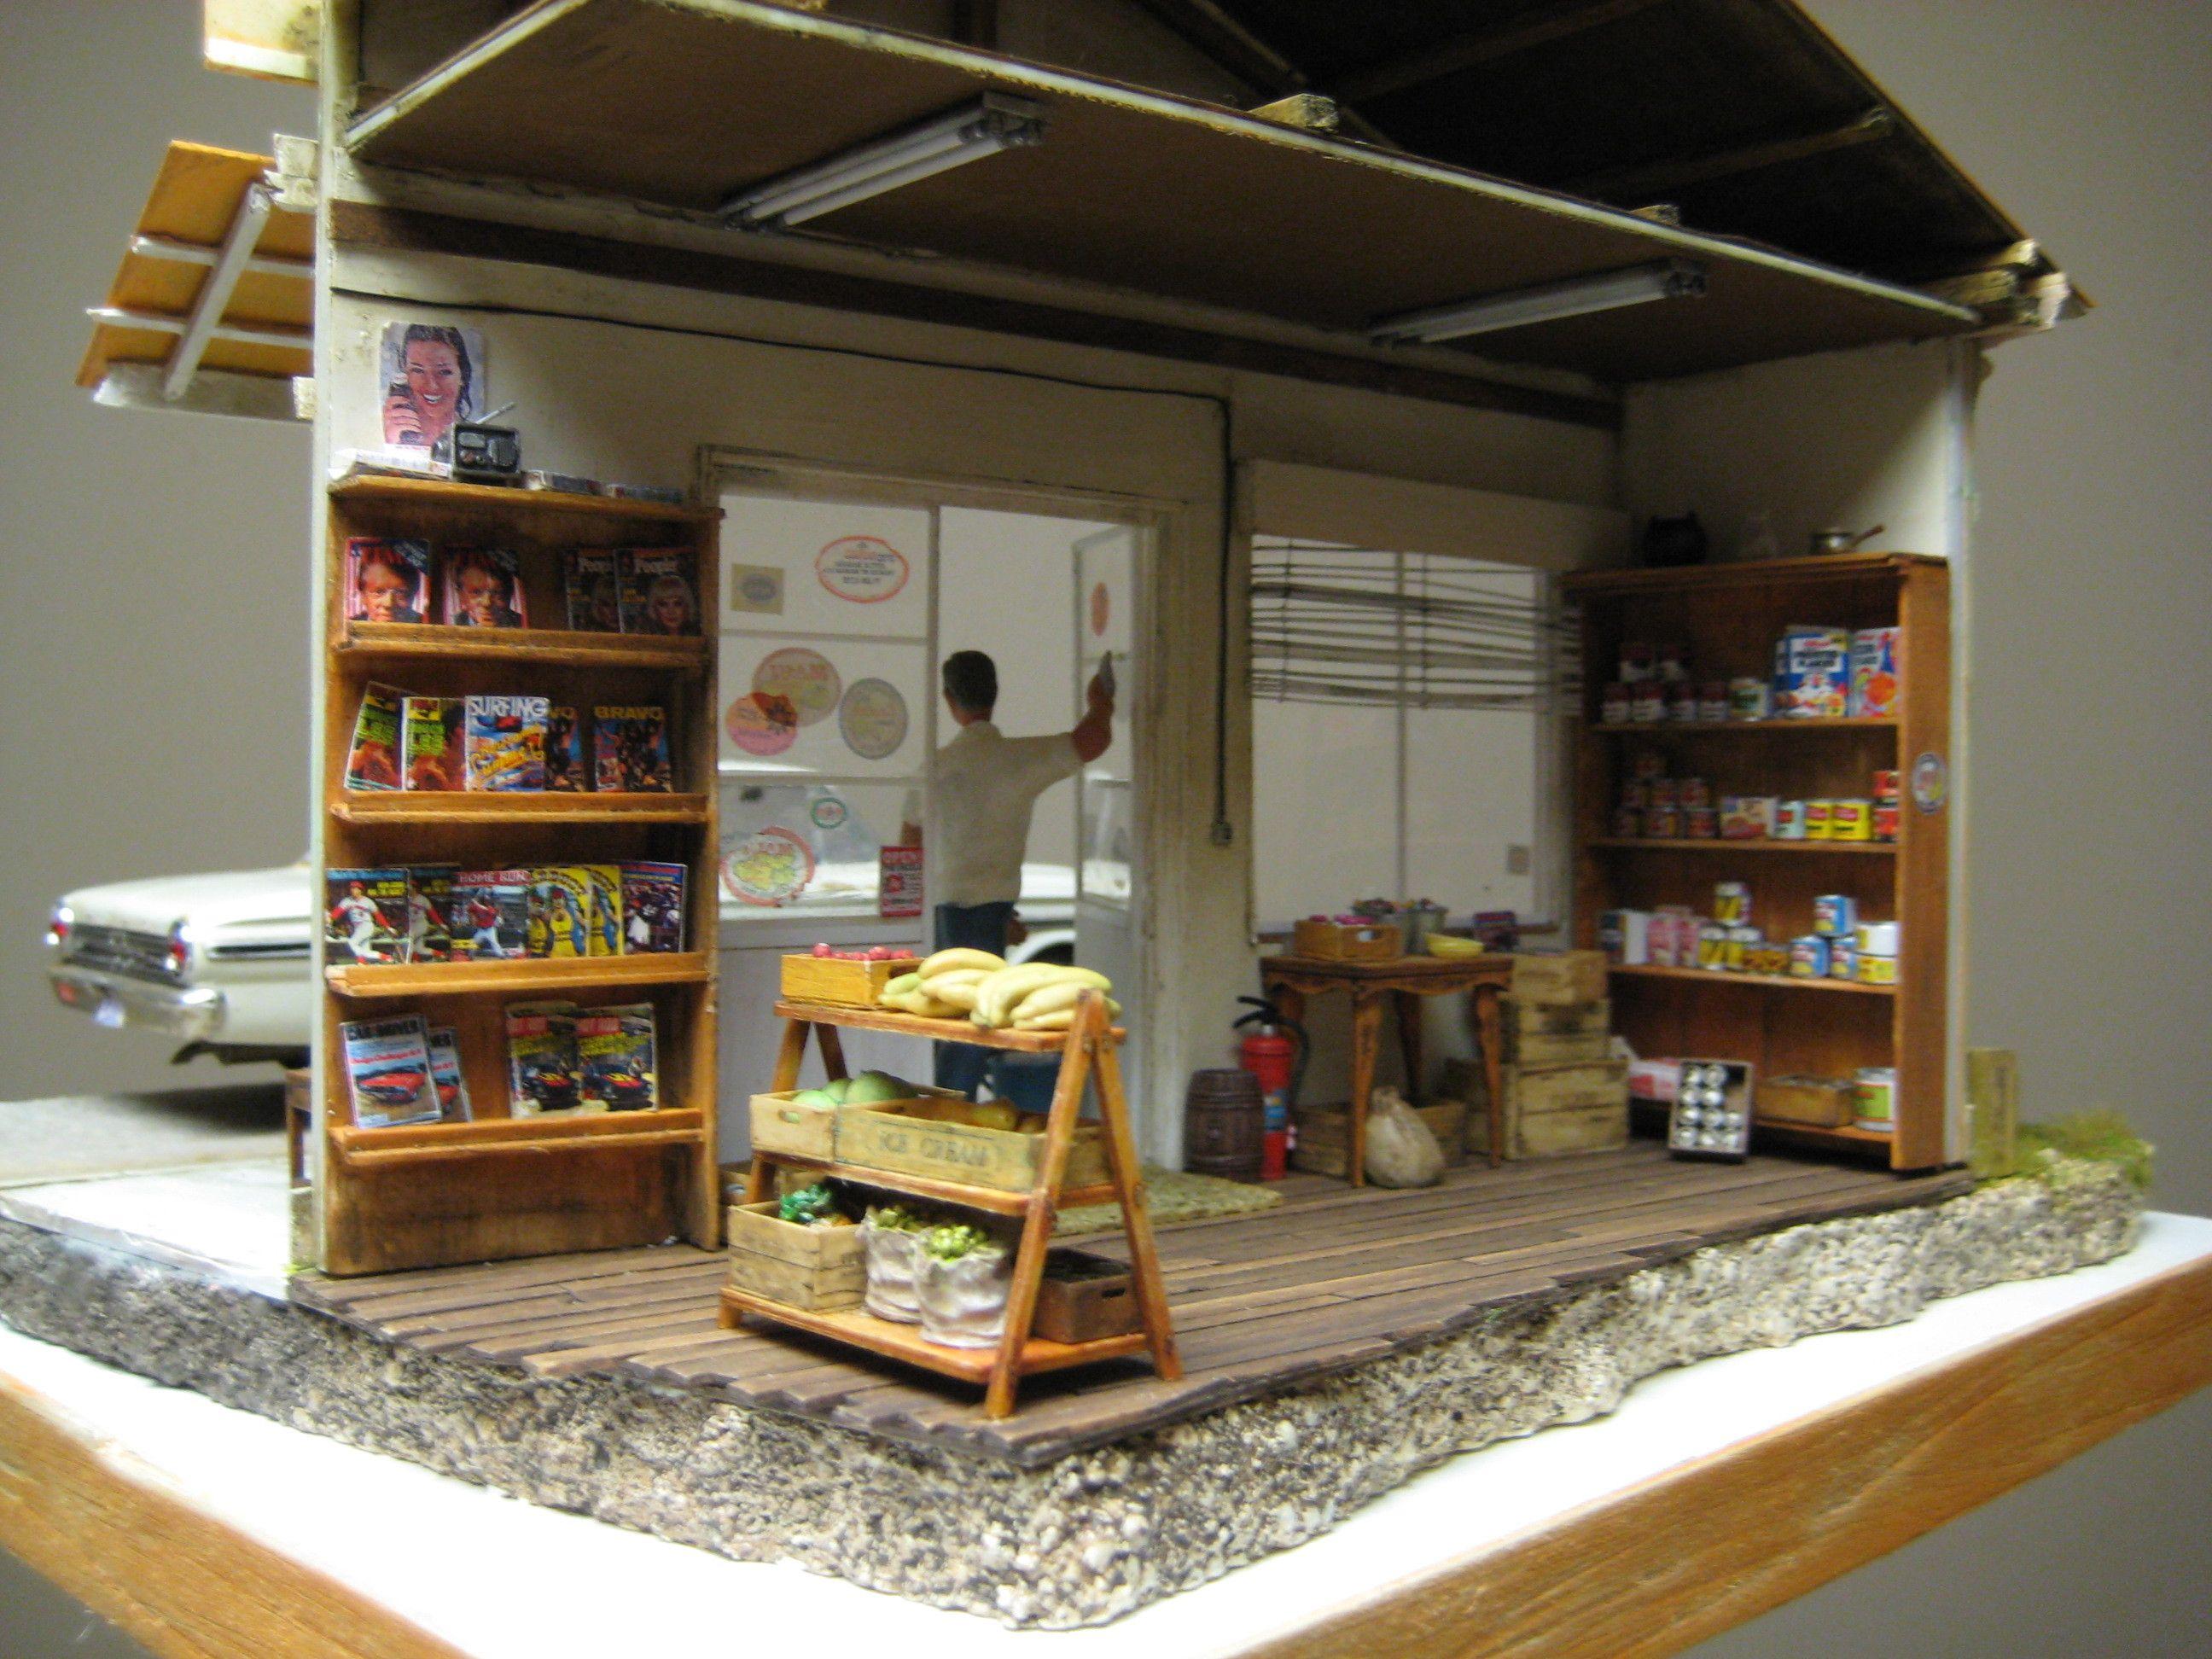 Tanishige Store 1 25 Scale Model Diorama Dioramas